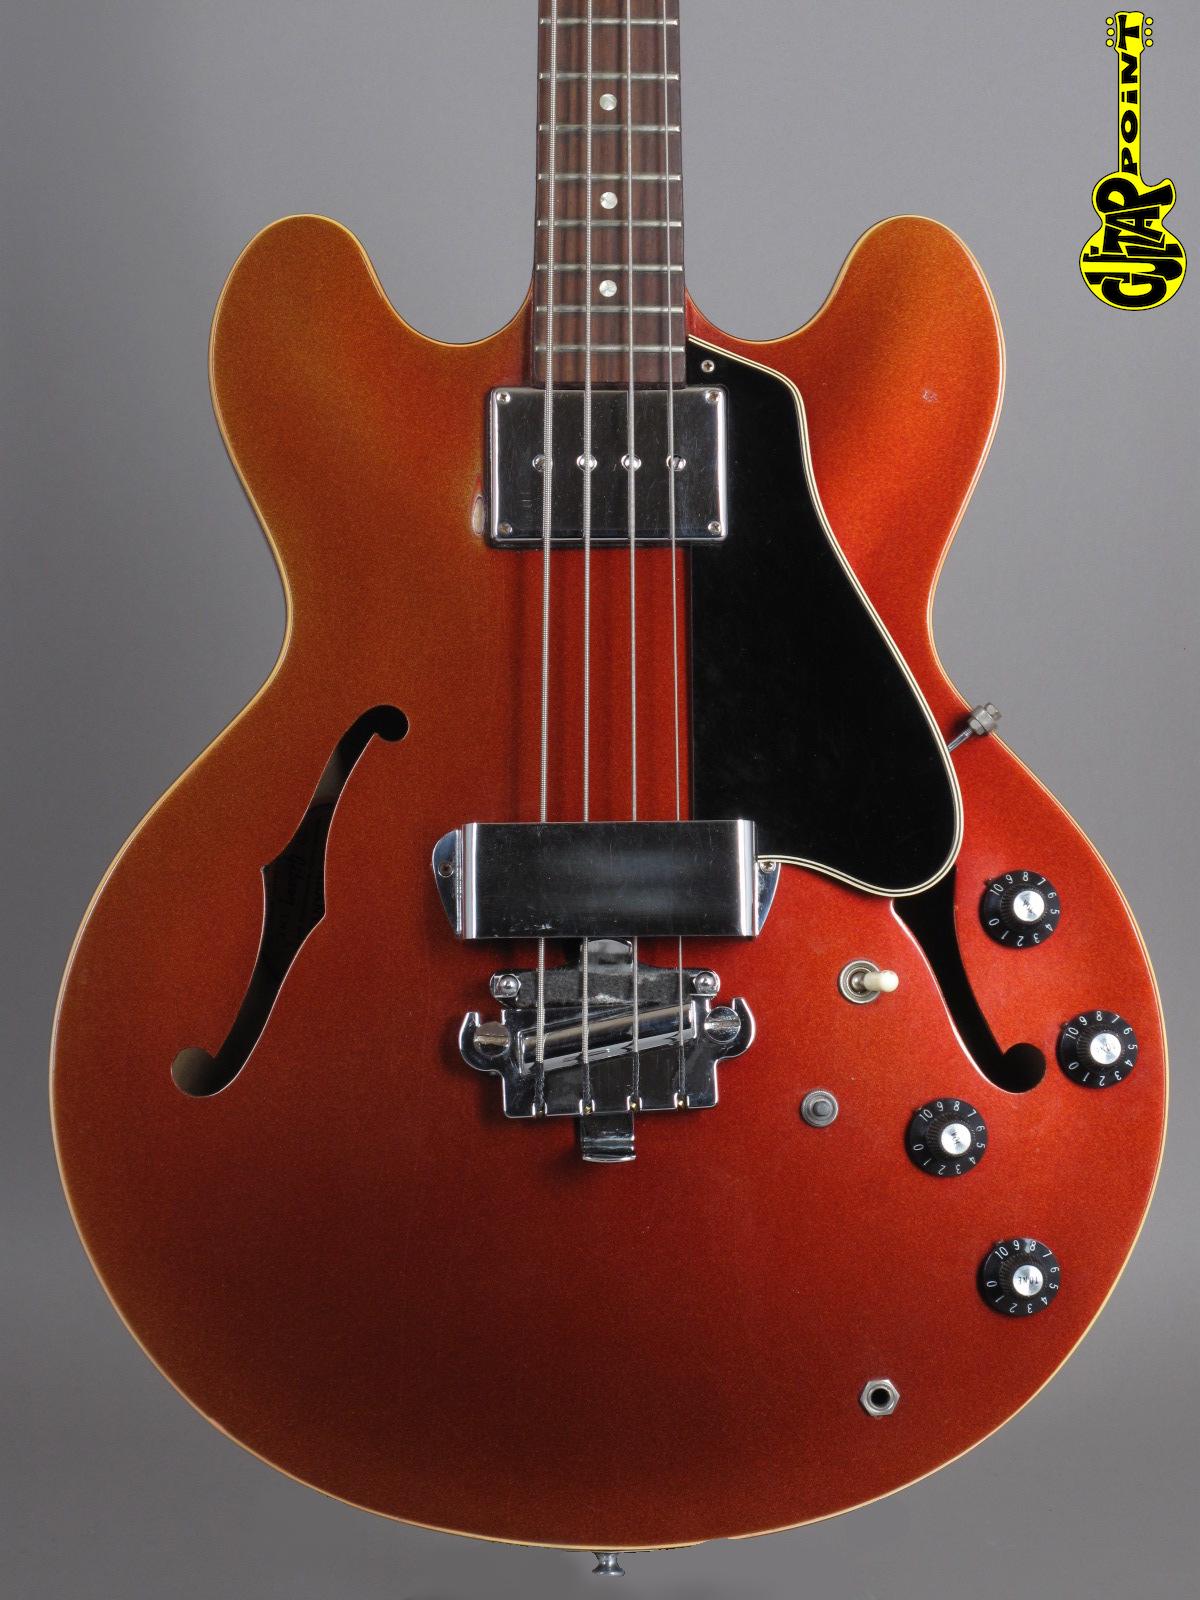 1967 EB-2 D Sparkling Burgundy - Ex-Joe Bonamassa